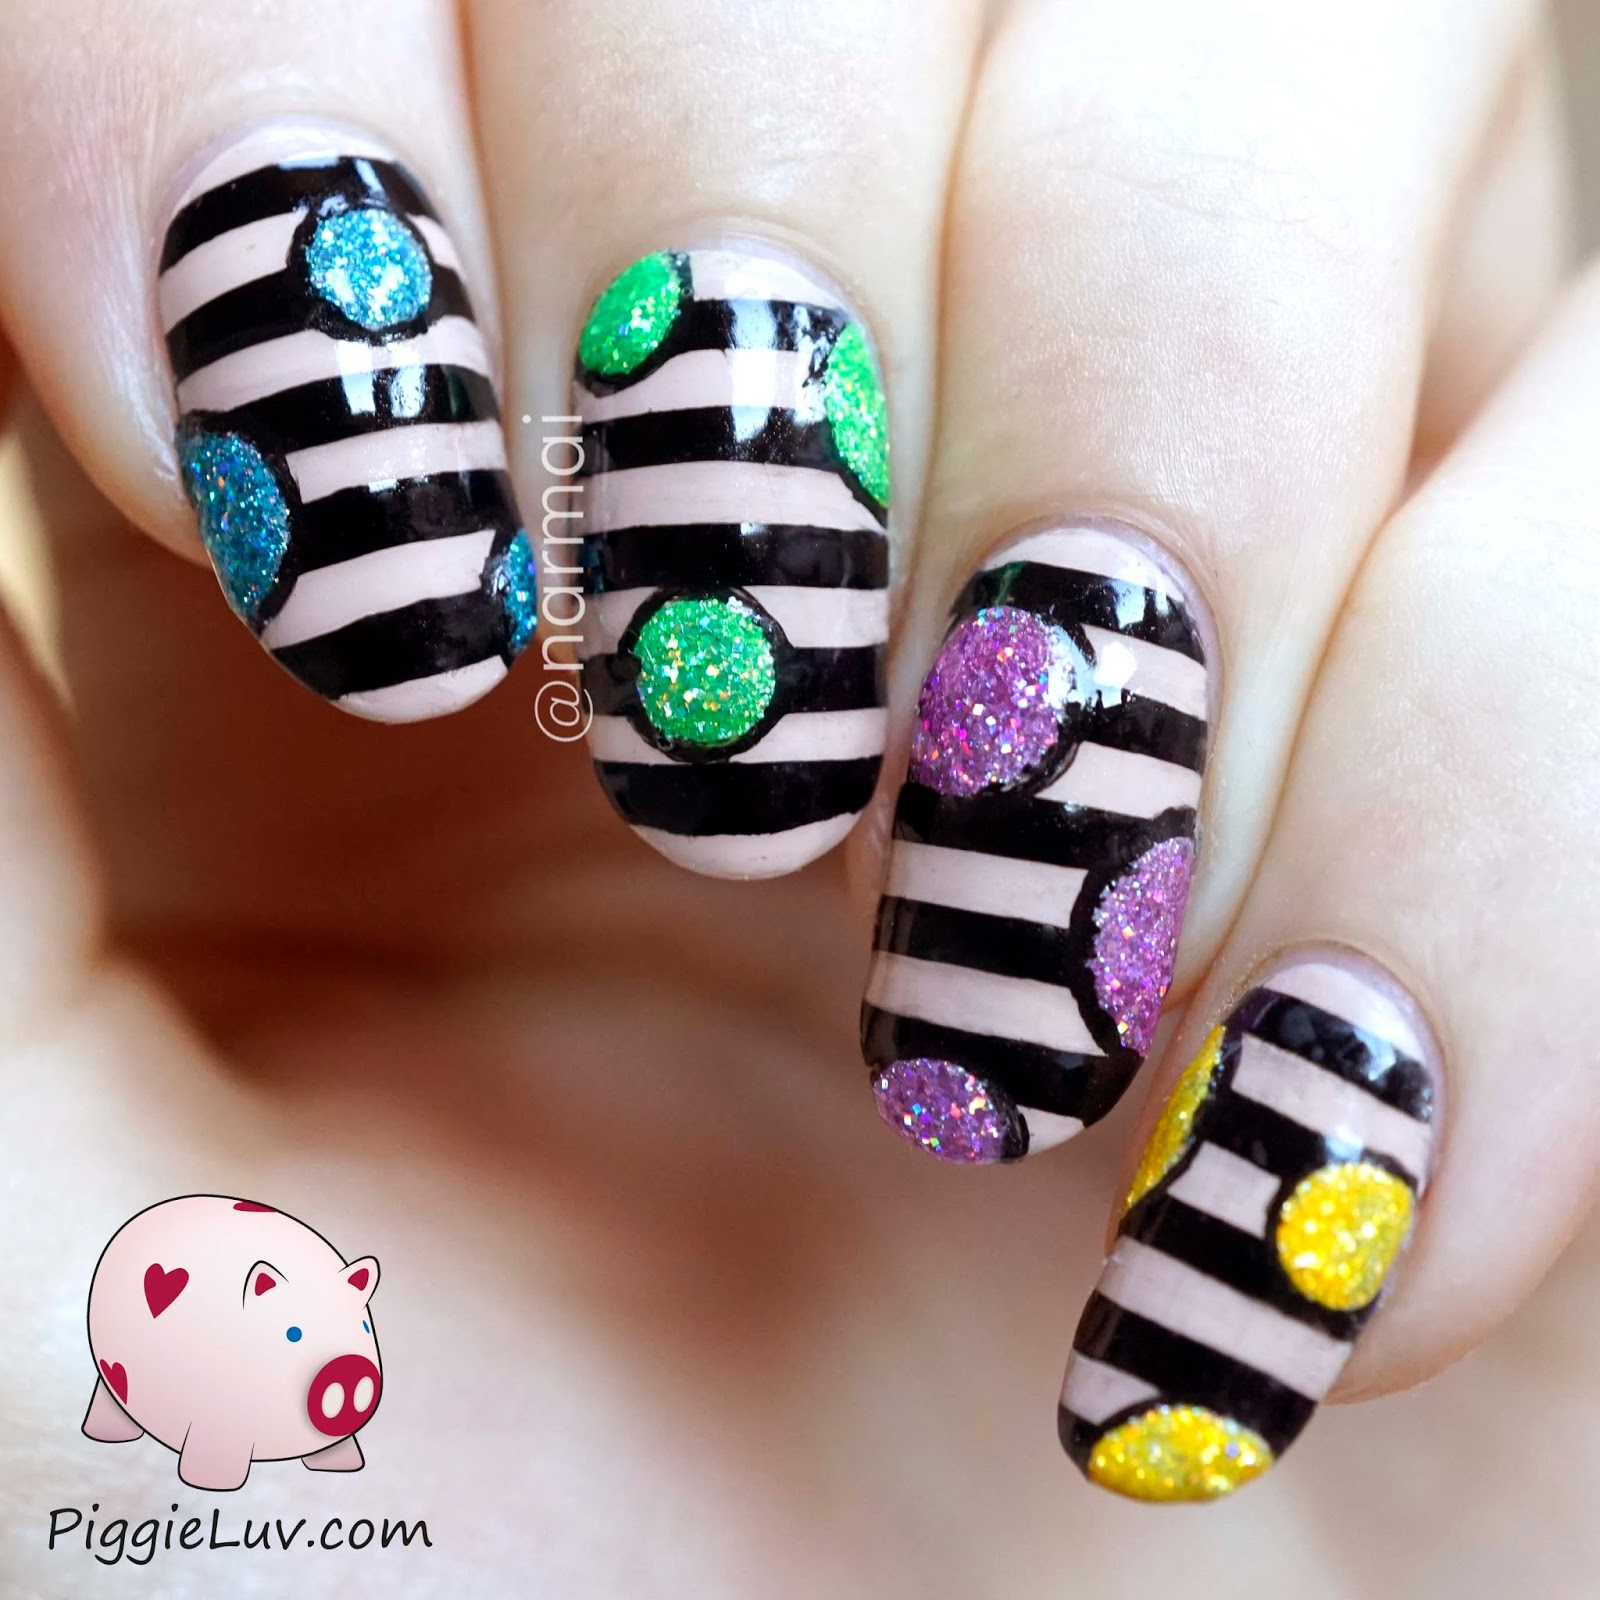 Piggieluv Rainbow Bubbles Nail Art: PiggieLuv: Stripey Nail Art Design With Glitter Orbs